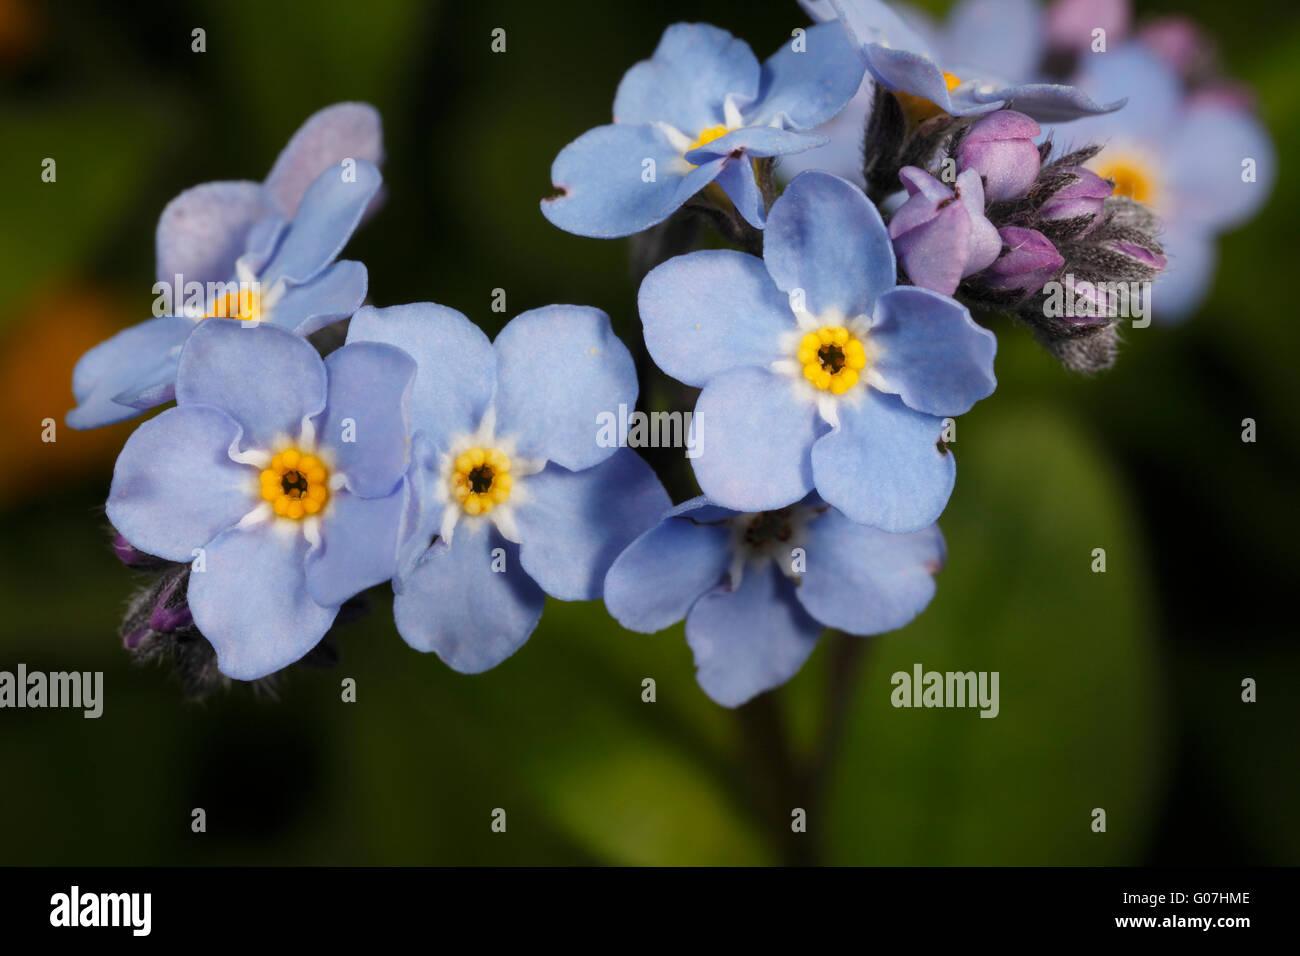 Forget-me-not flowers. Wild British flower. Myosotis sylvatica. UK Spring. Springtime flower. Stock Photo